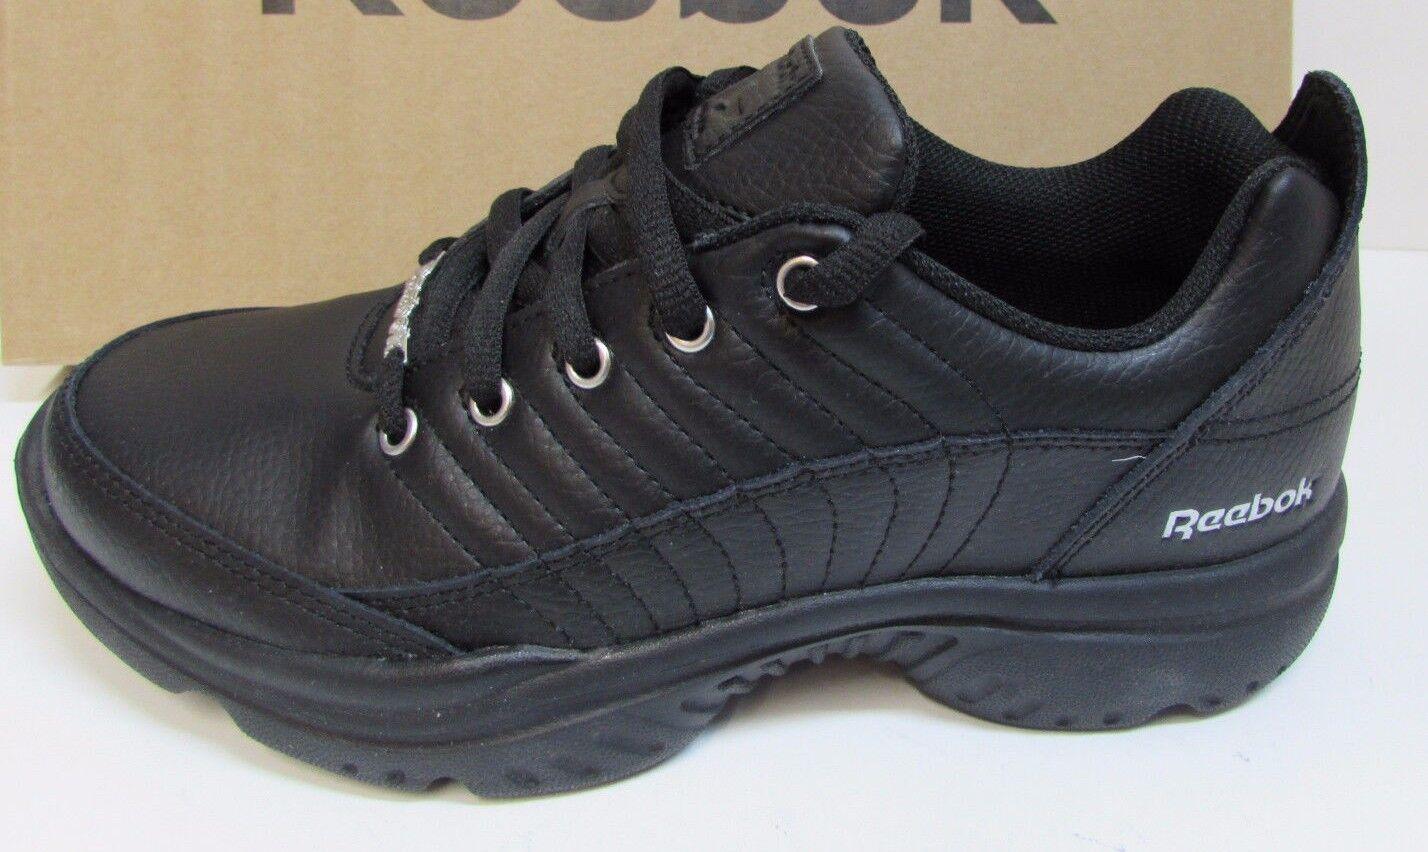 Reebok Size 7 Black Ortholite Sneakers New Womens Shoes